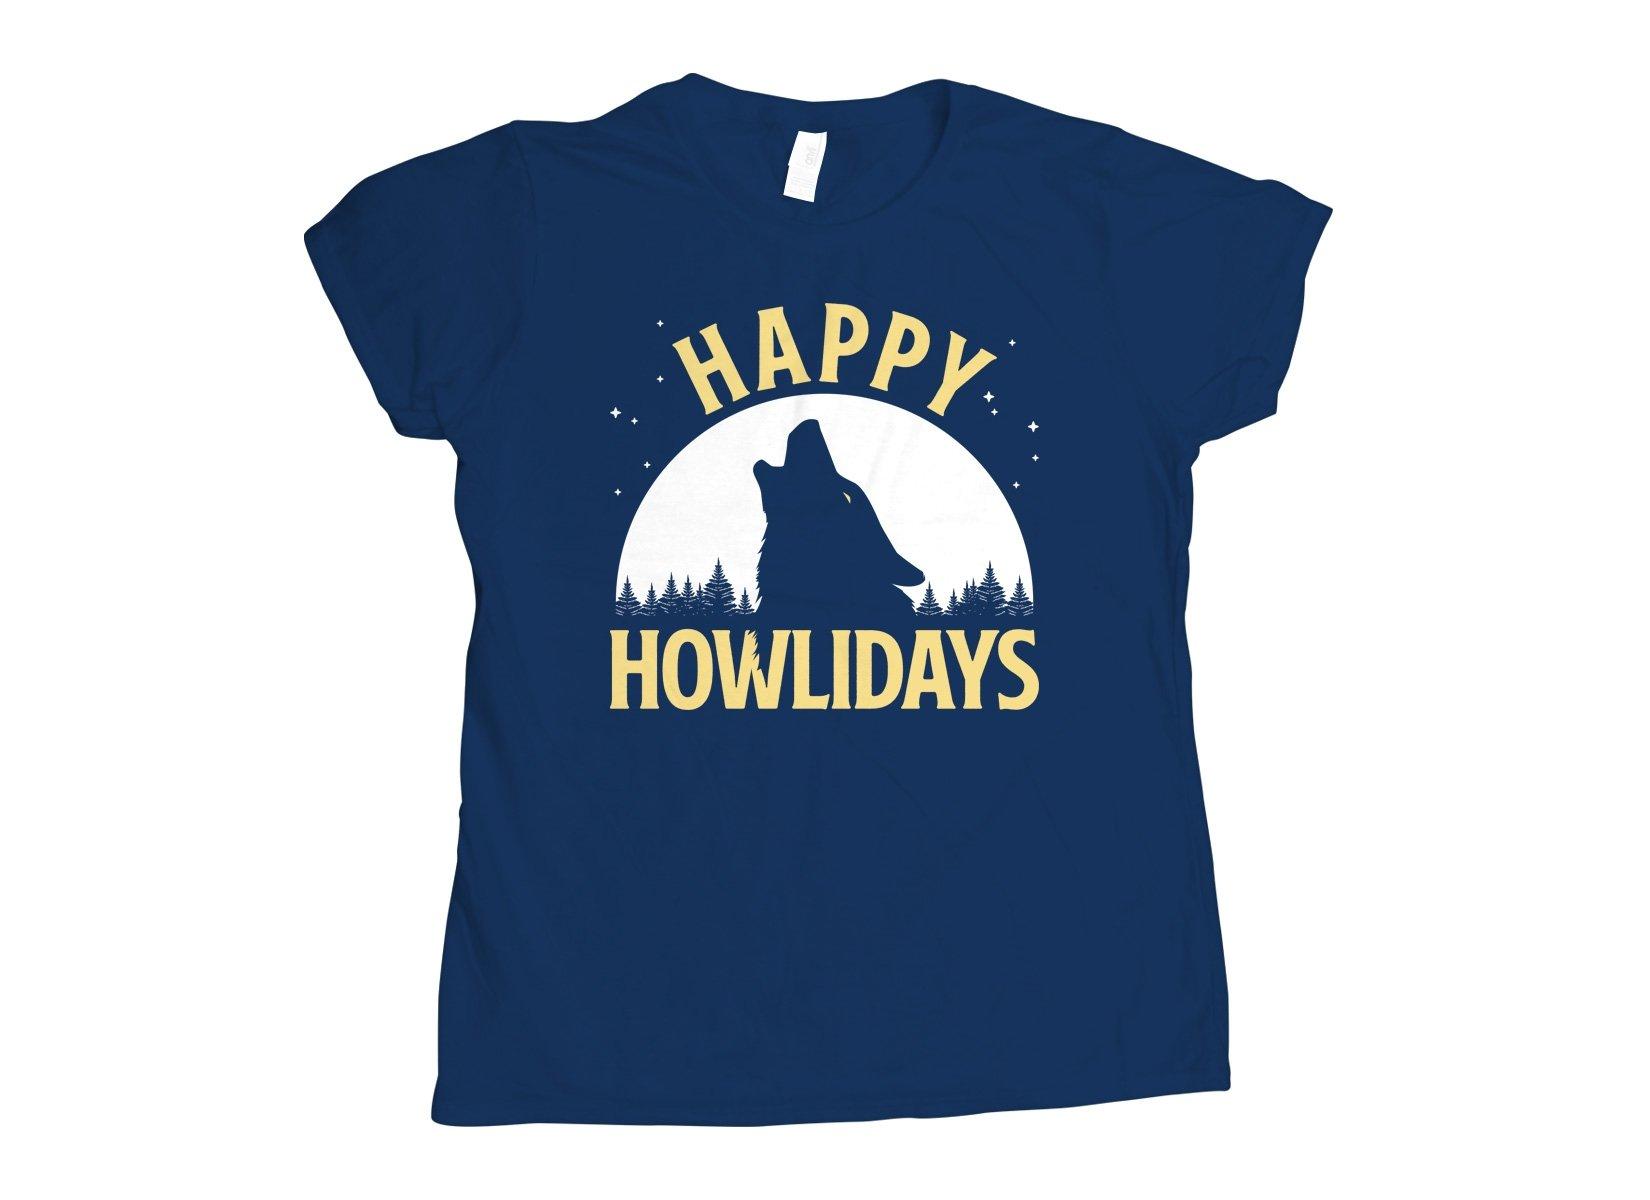 Happy Howlidays on Womens T-Shirt